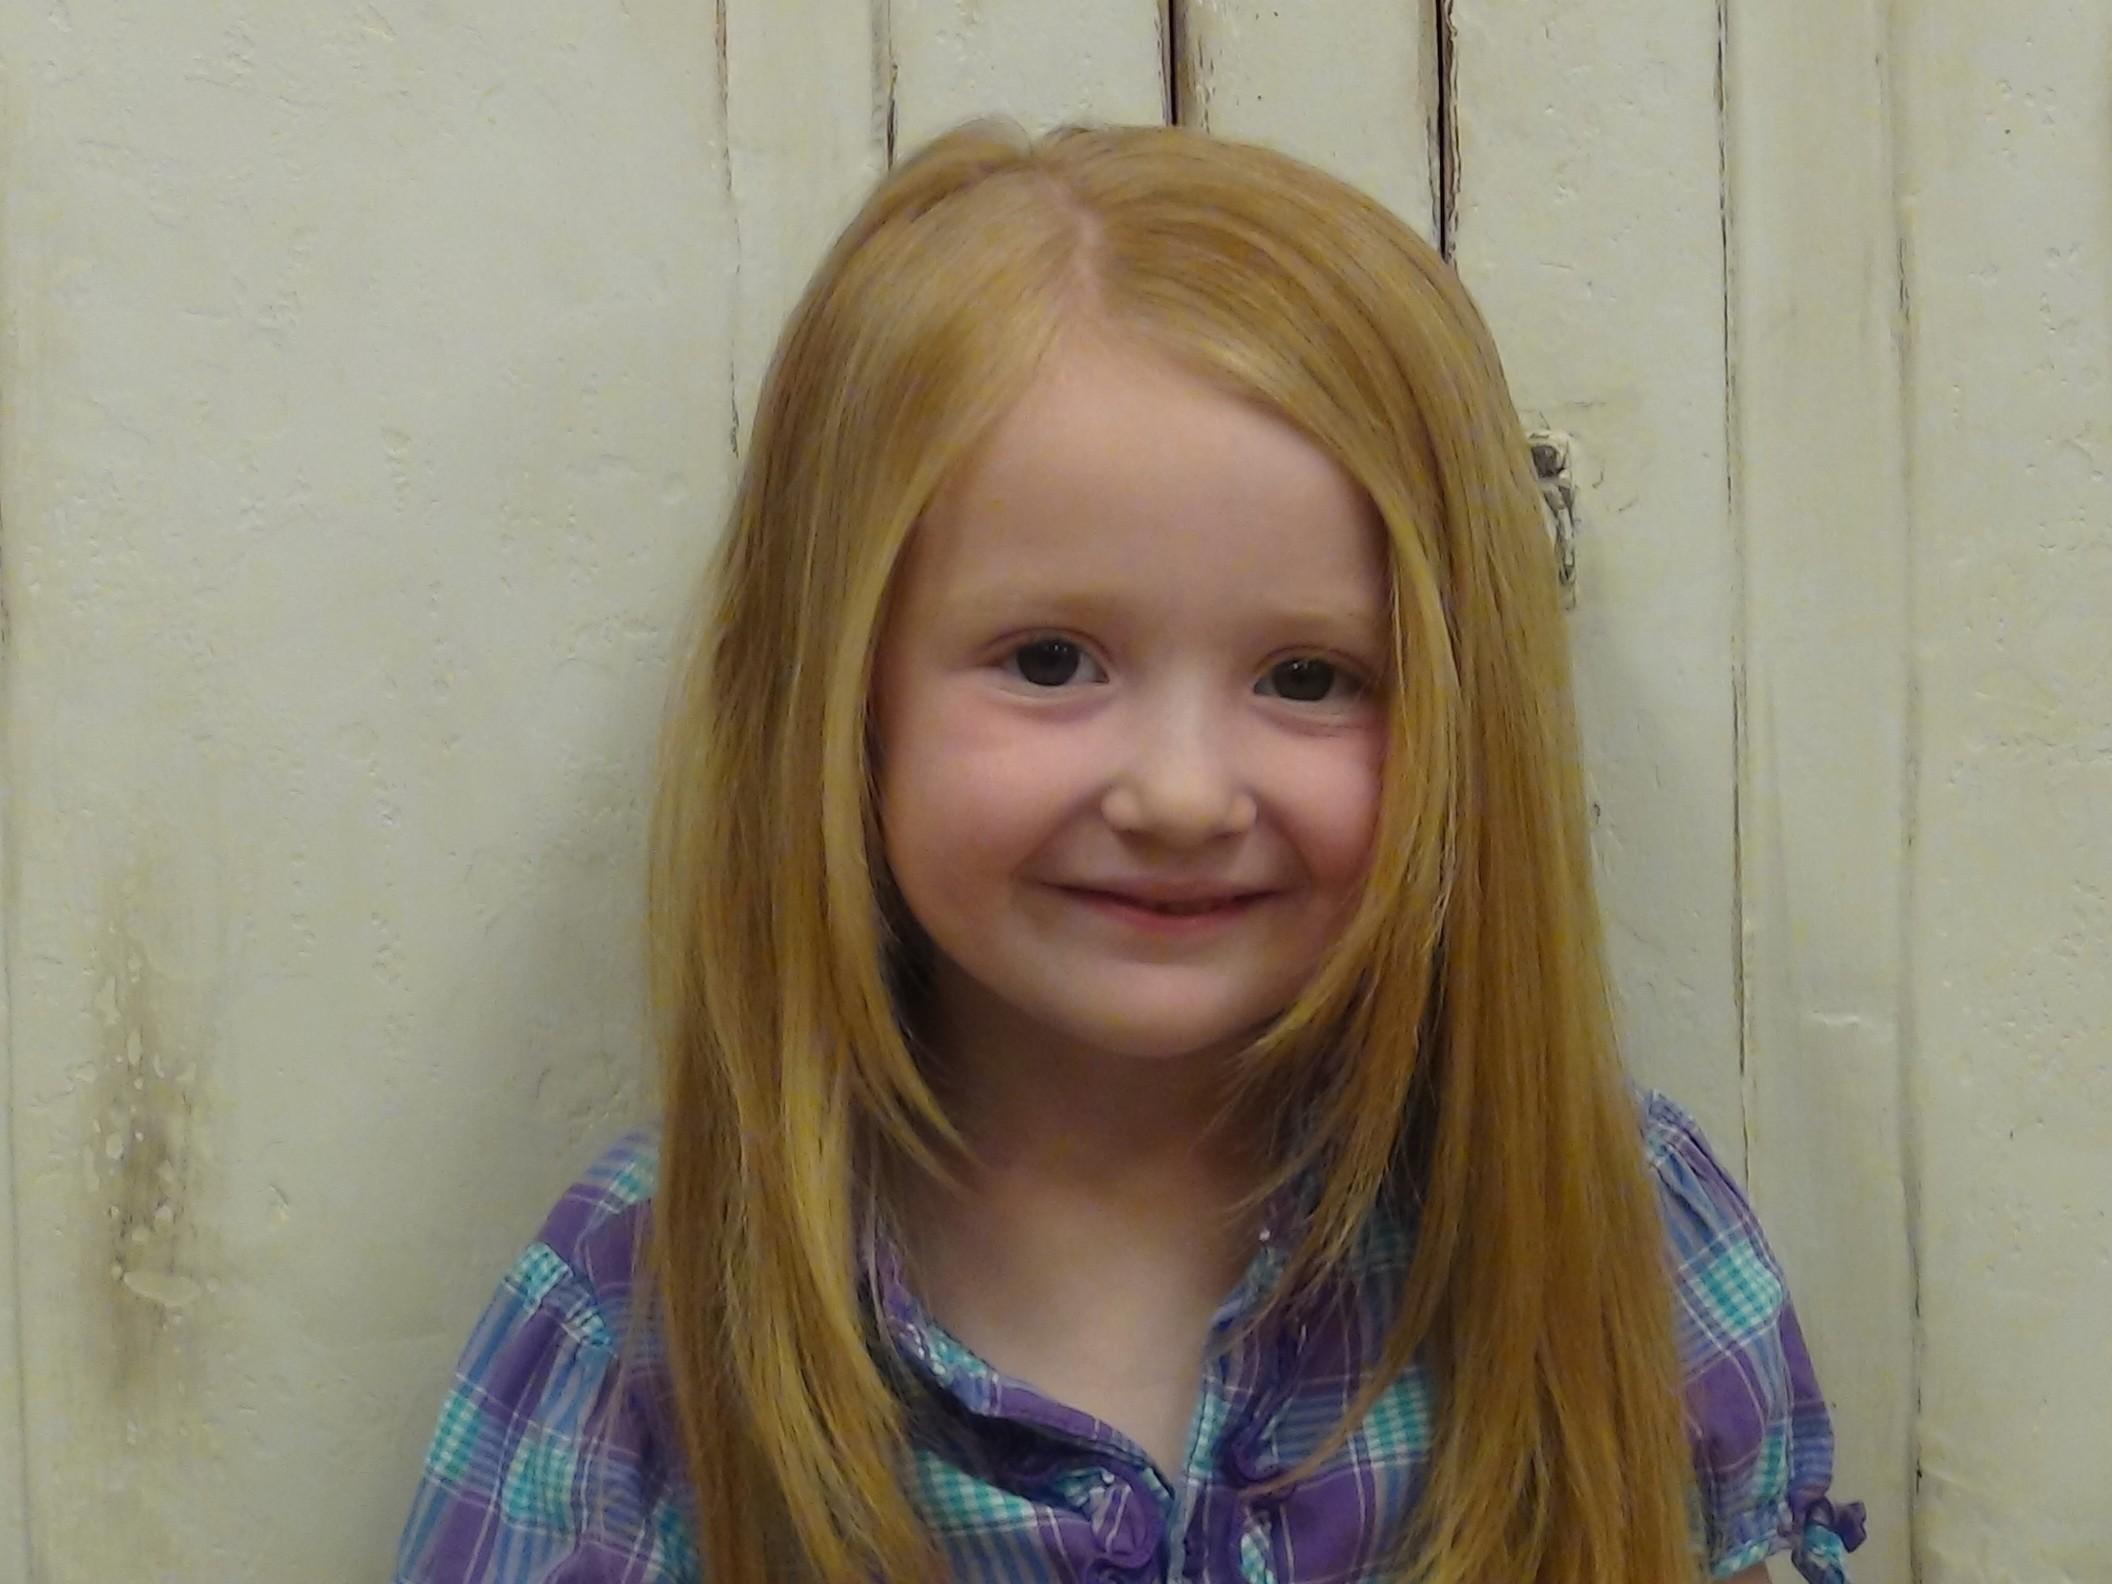 Cute Hairstyles : New Cute Kid Hairstyles Long Hair Photo On Design ...